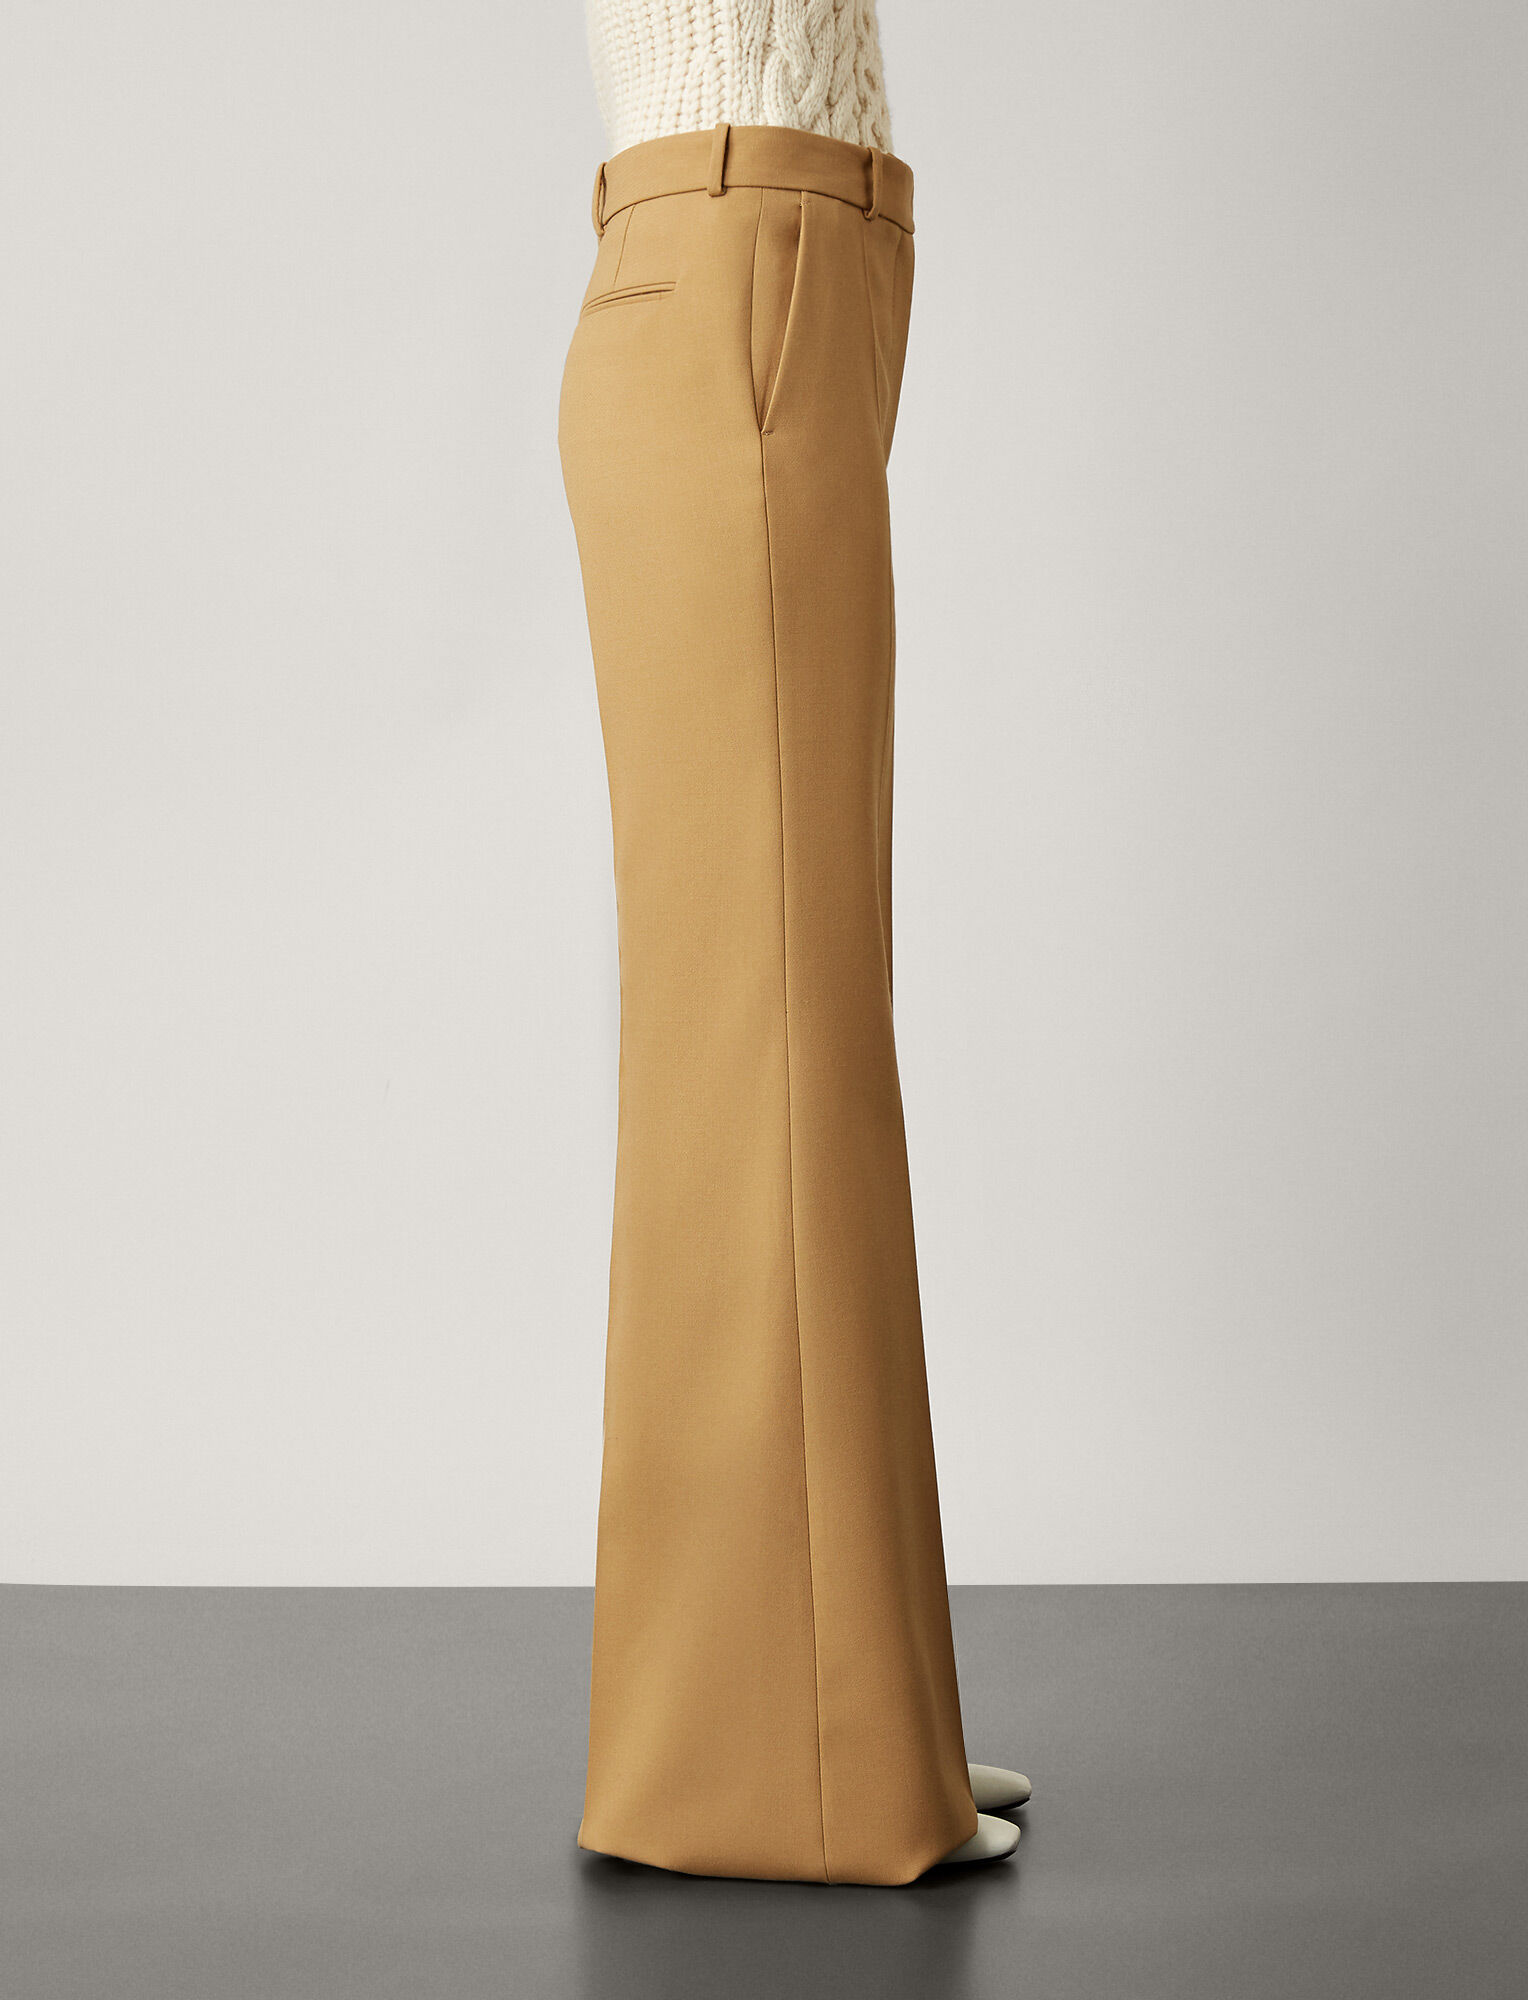 Joseph, Valmy Wool Granite Trousers, in CAMEL